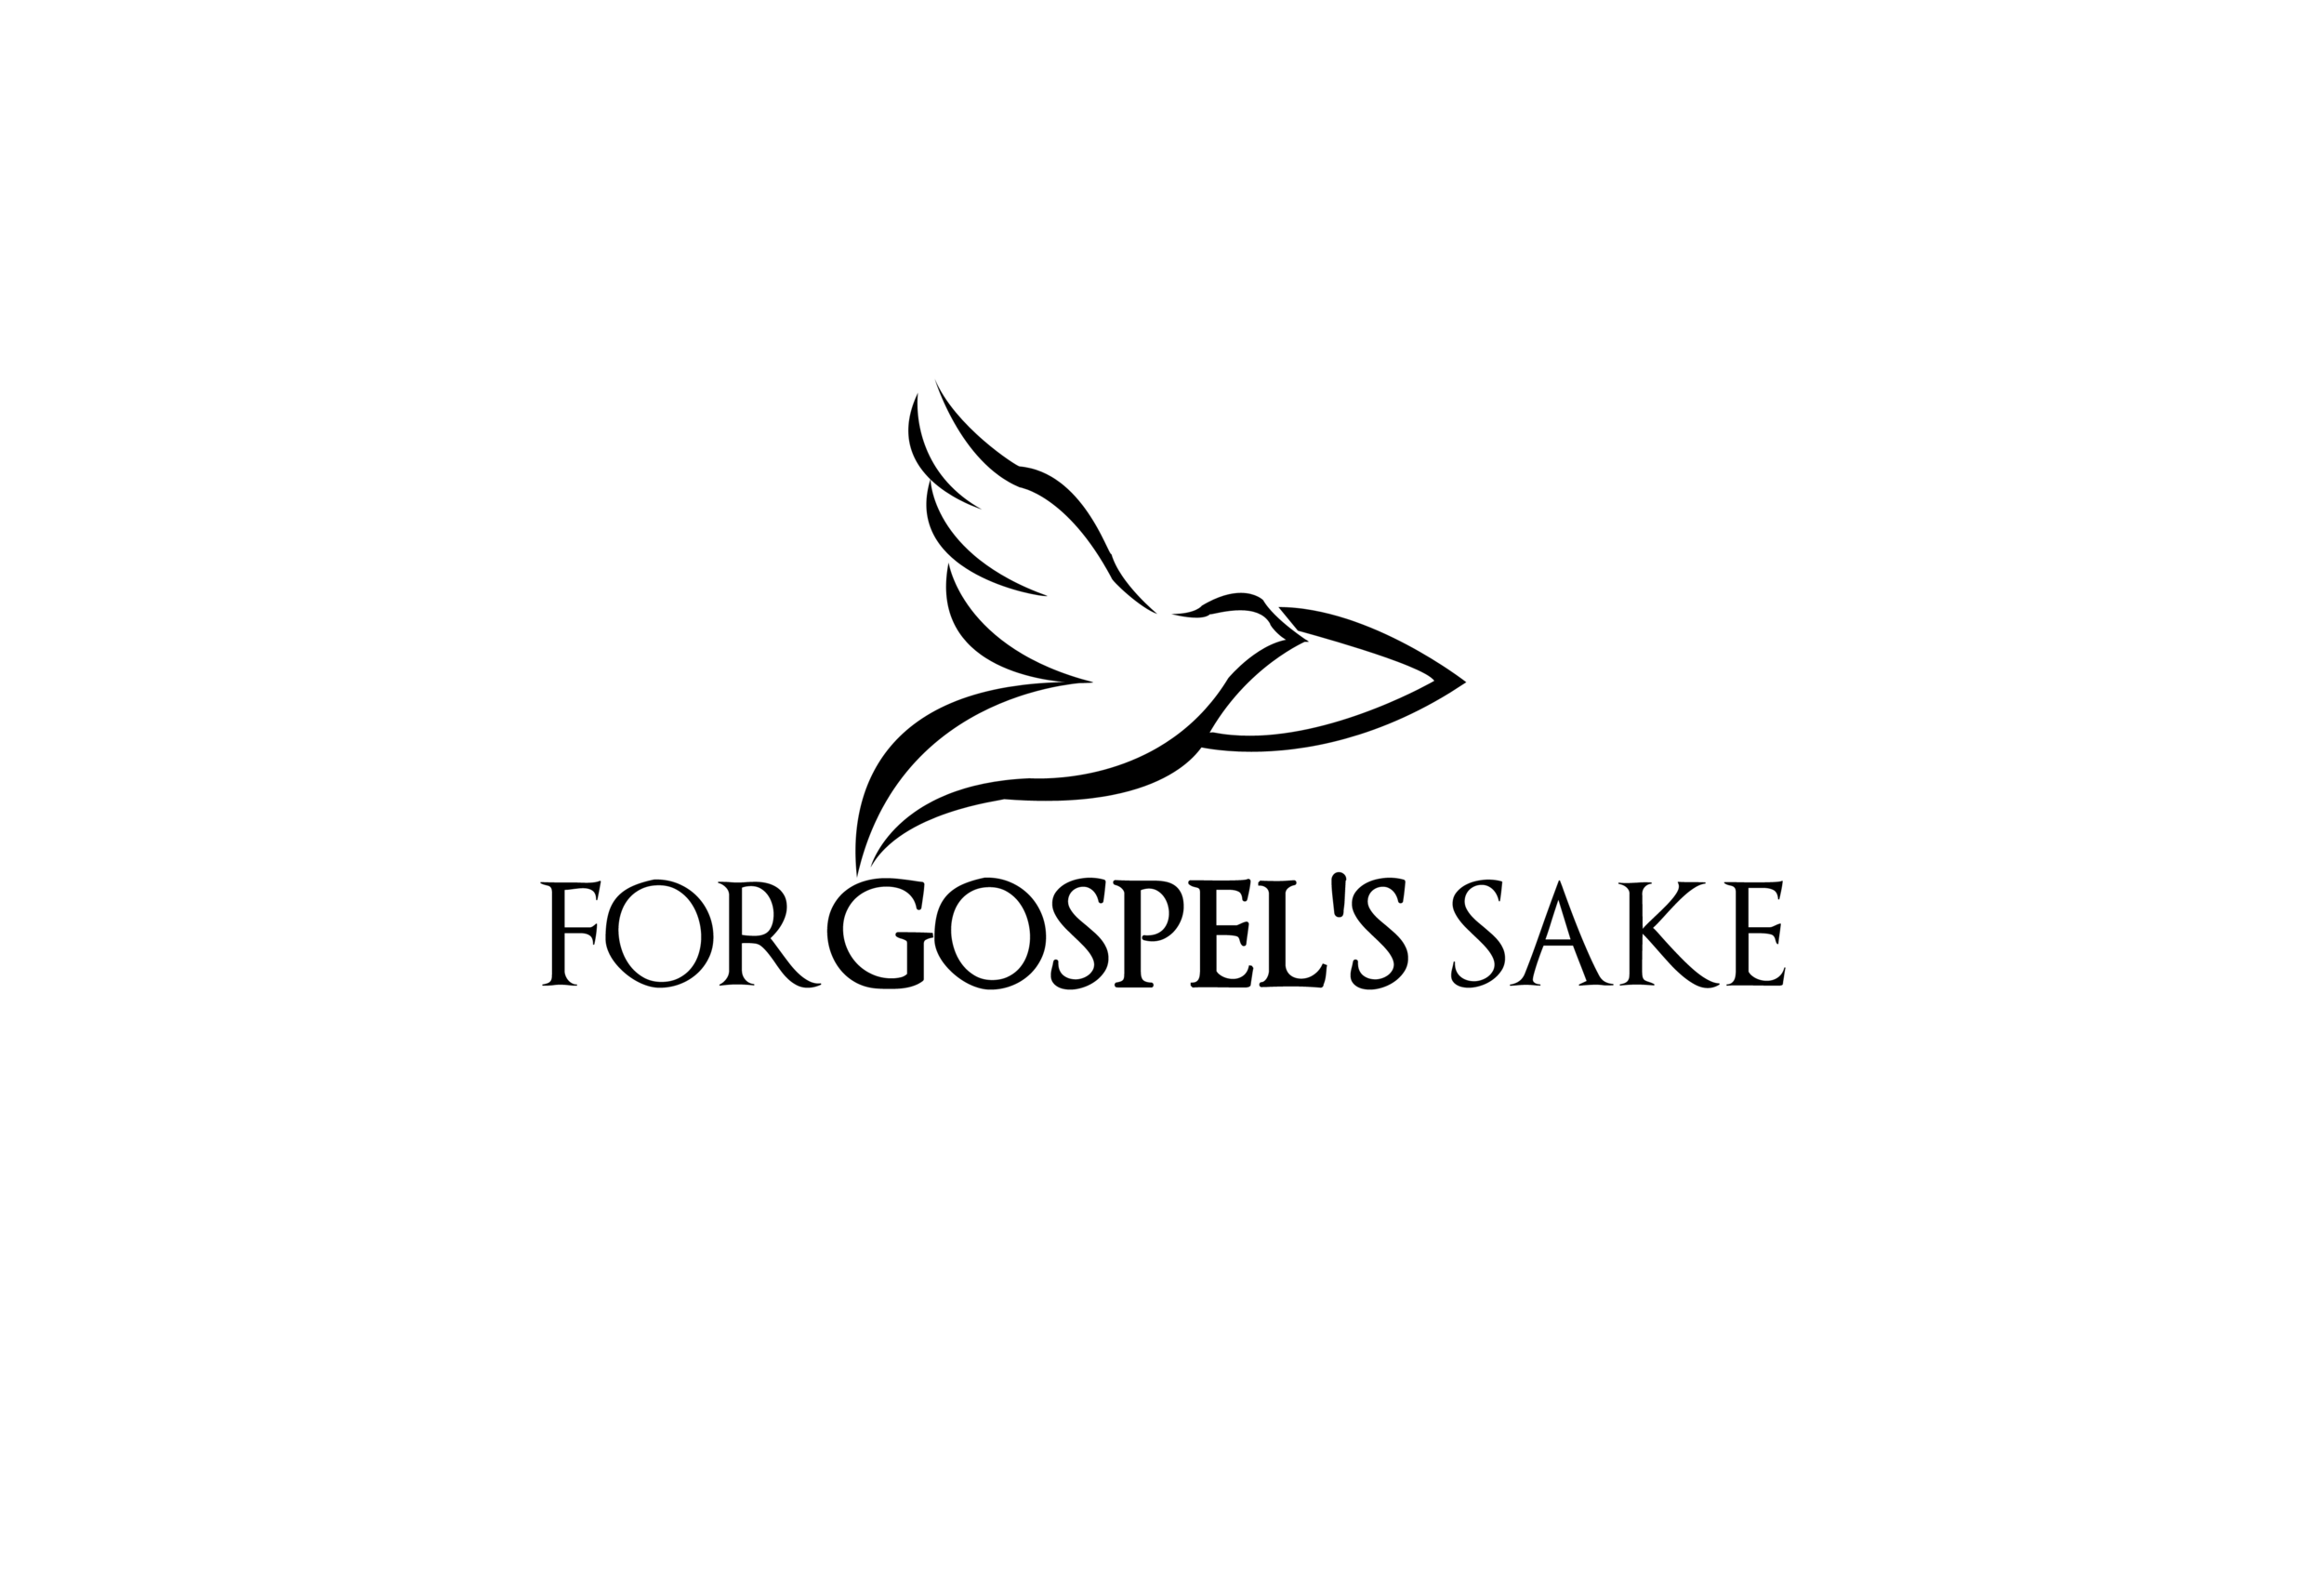 4gs_black-1.png